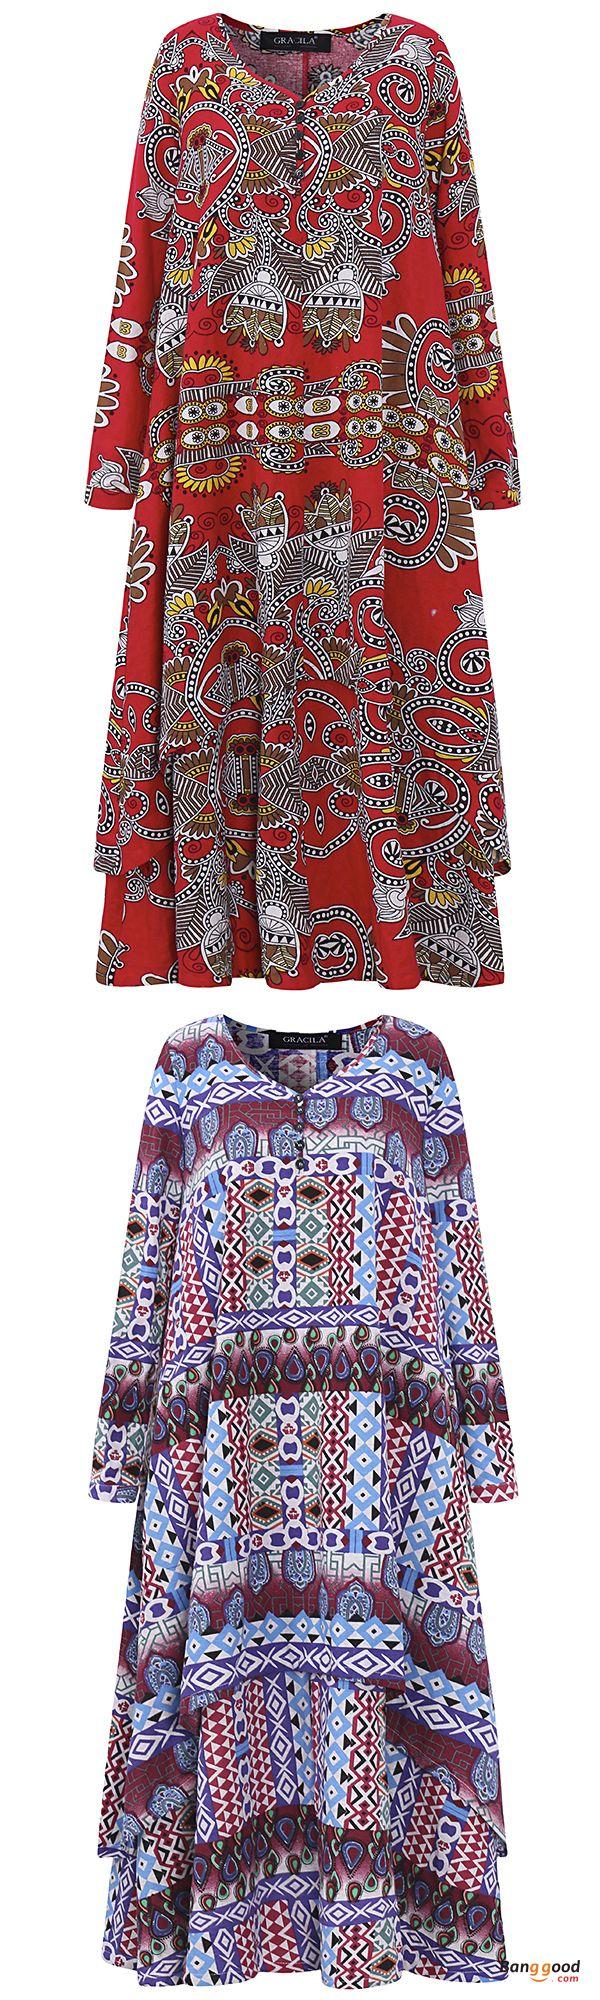 US$31.99 + Free shipping. Size: S~5XL. Women's Dresses, Women's Fashion, Elegant Style, Long Dresses. SHOP NOW!